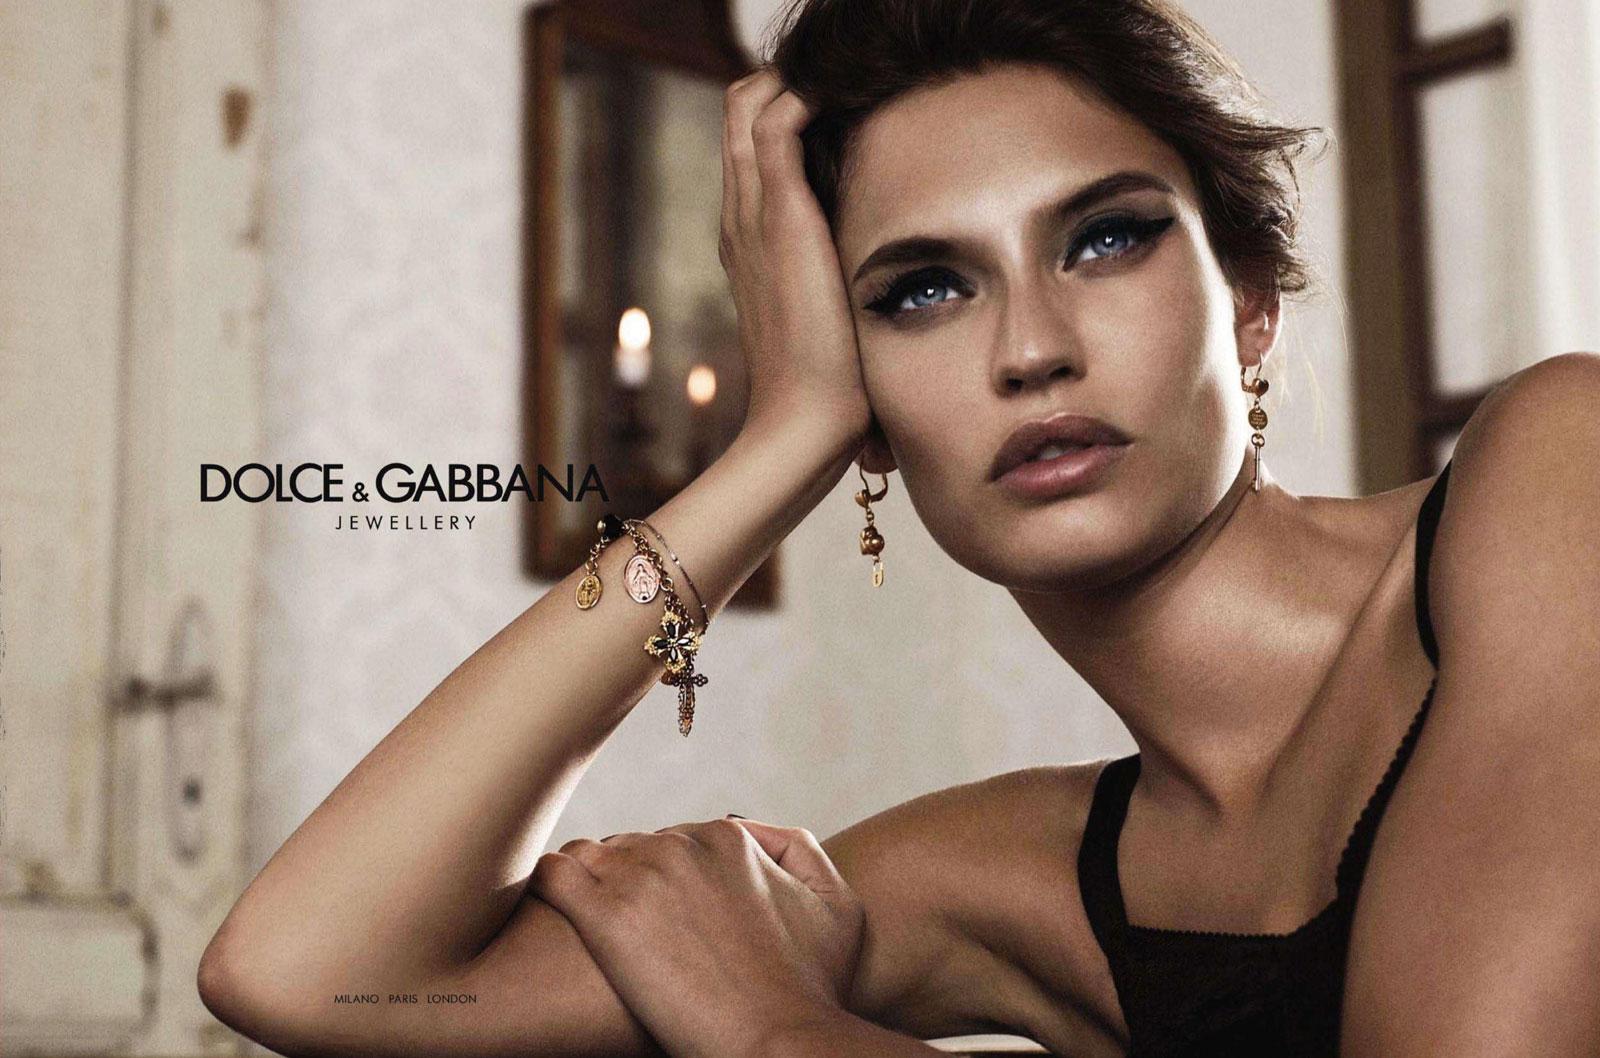 http://www.designscene.net/wp-content/uploads/2011/10/Bianca-Balti-by-Giampaolo-Sgura-DolceGabbana-Jewelry-DesignSceneNet-01.jpg